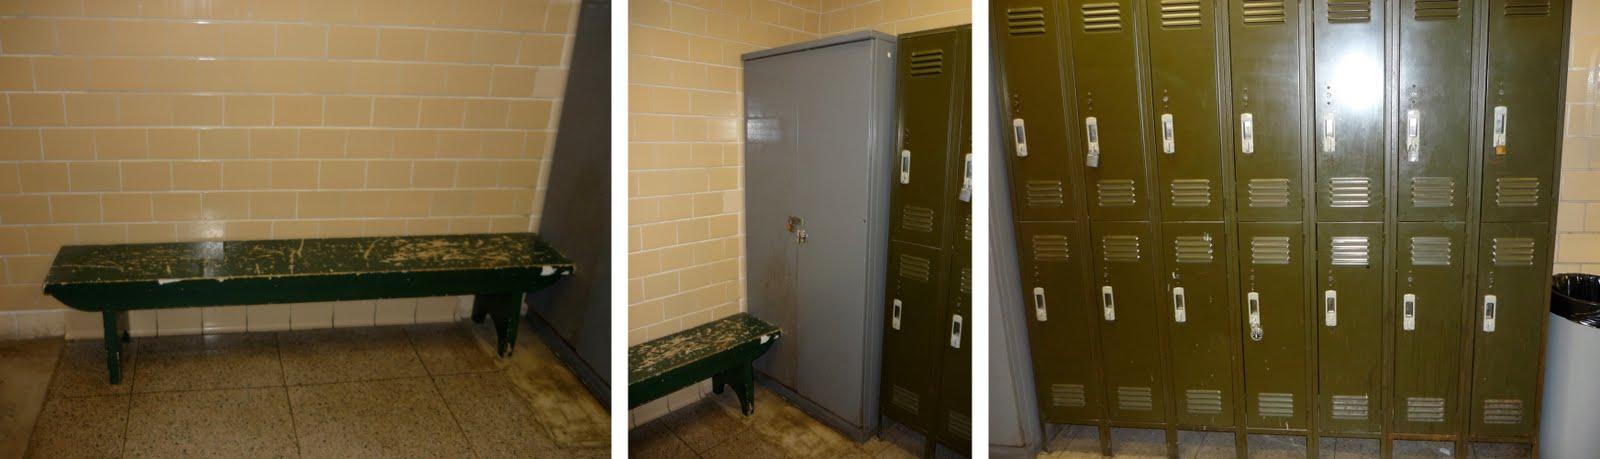 American Bathroom: Penn State Reber Building: A Bathroom Full of ...